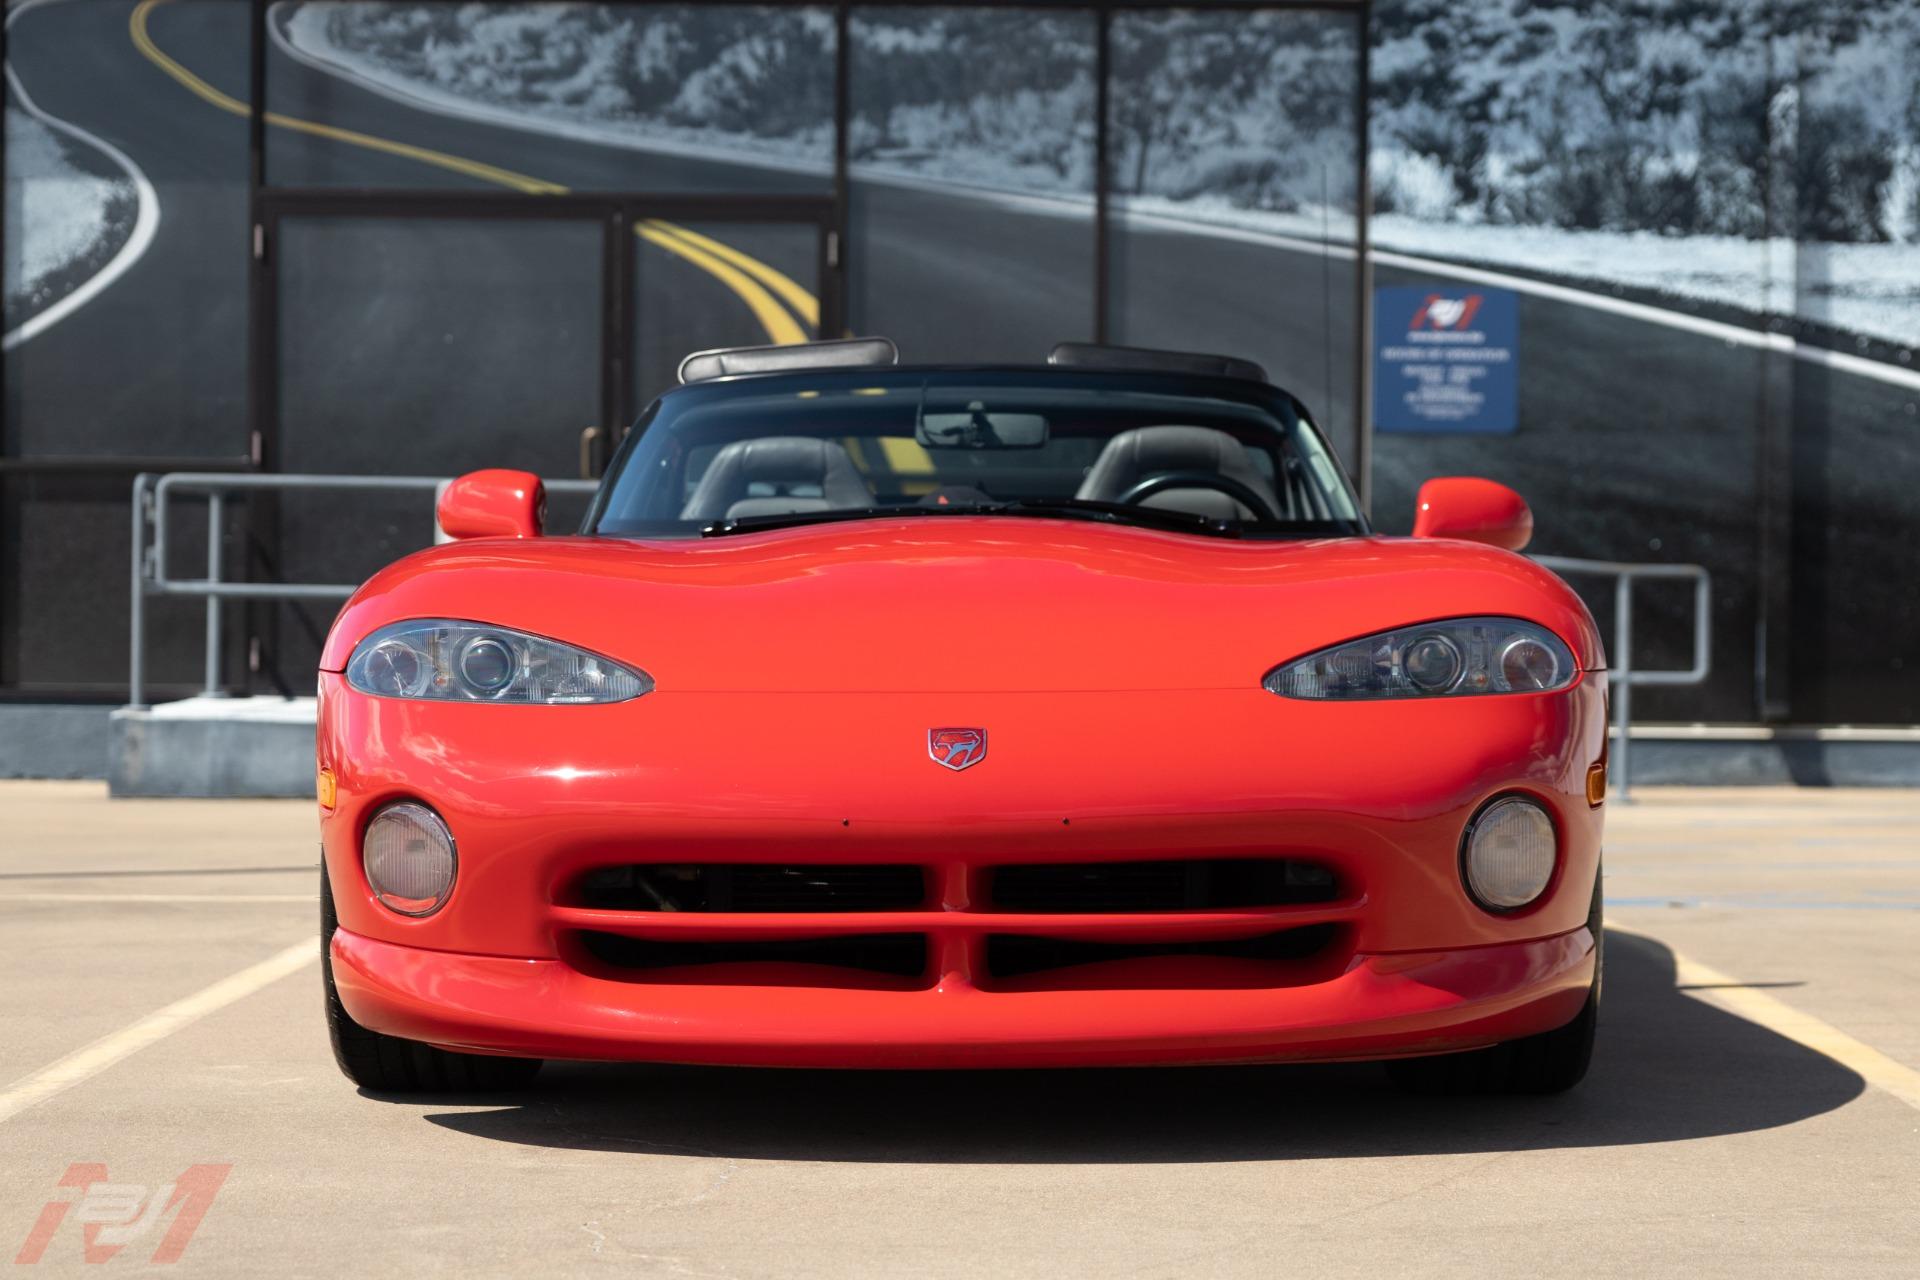 Used 1993 Dodge Viper RT/10 For Sale ($42,995) | BJ Motors